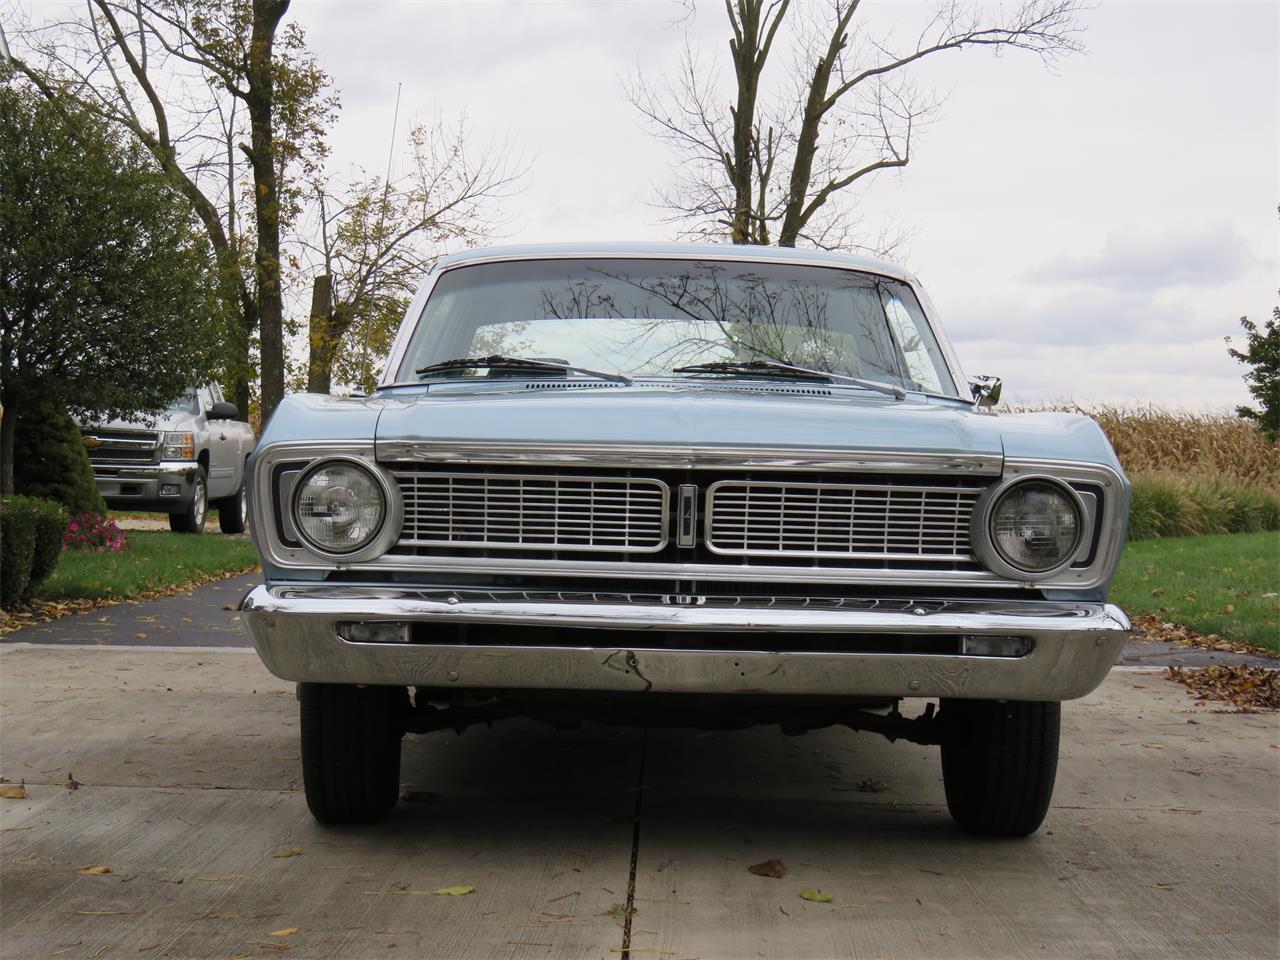 Kokomo Car Dealers >> 1970 Ford Falcon Futura for Sale | ClassicCars.com | CC ...